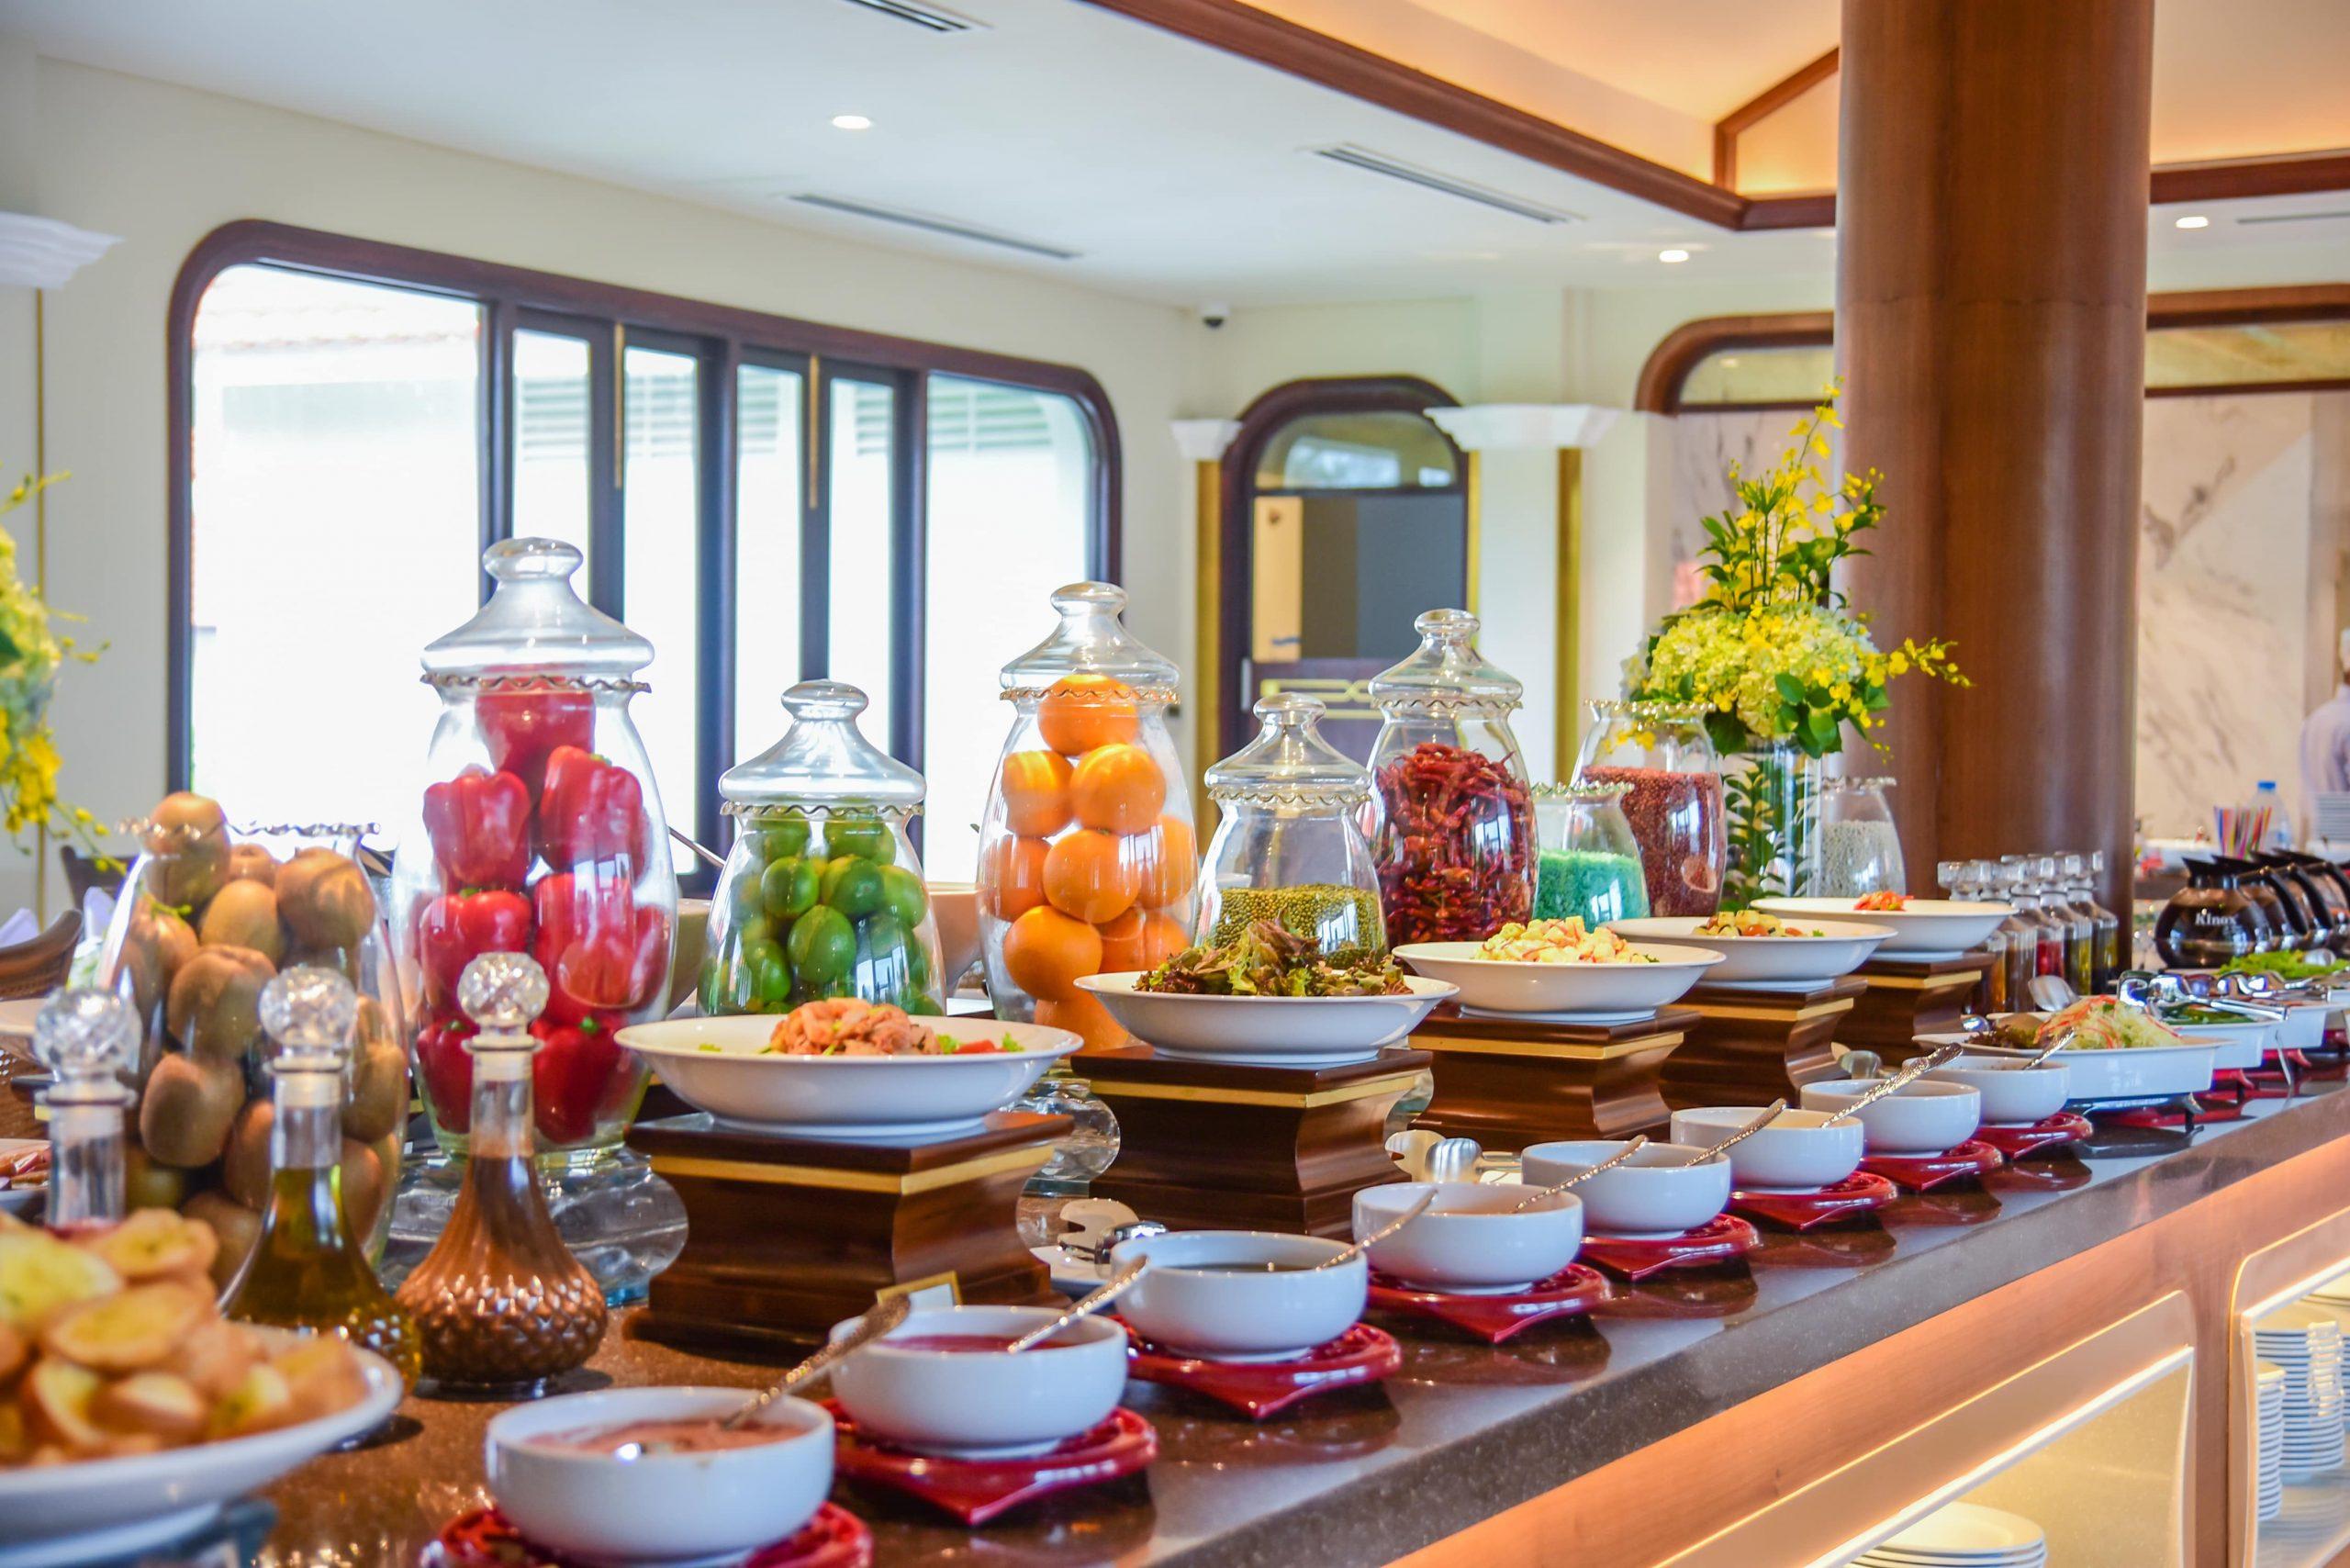 Nha hàng Danakasa tại Furama Resort